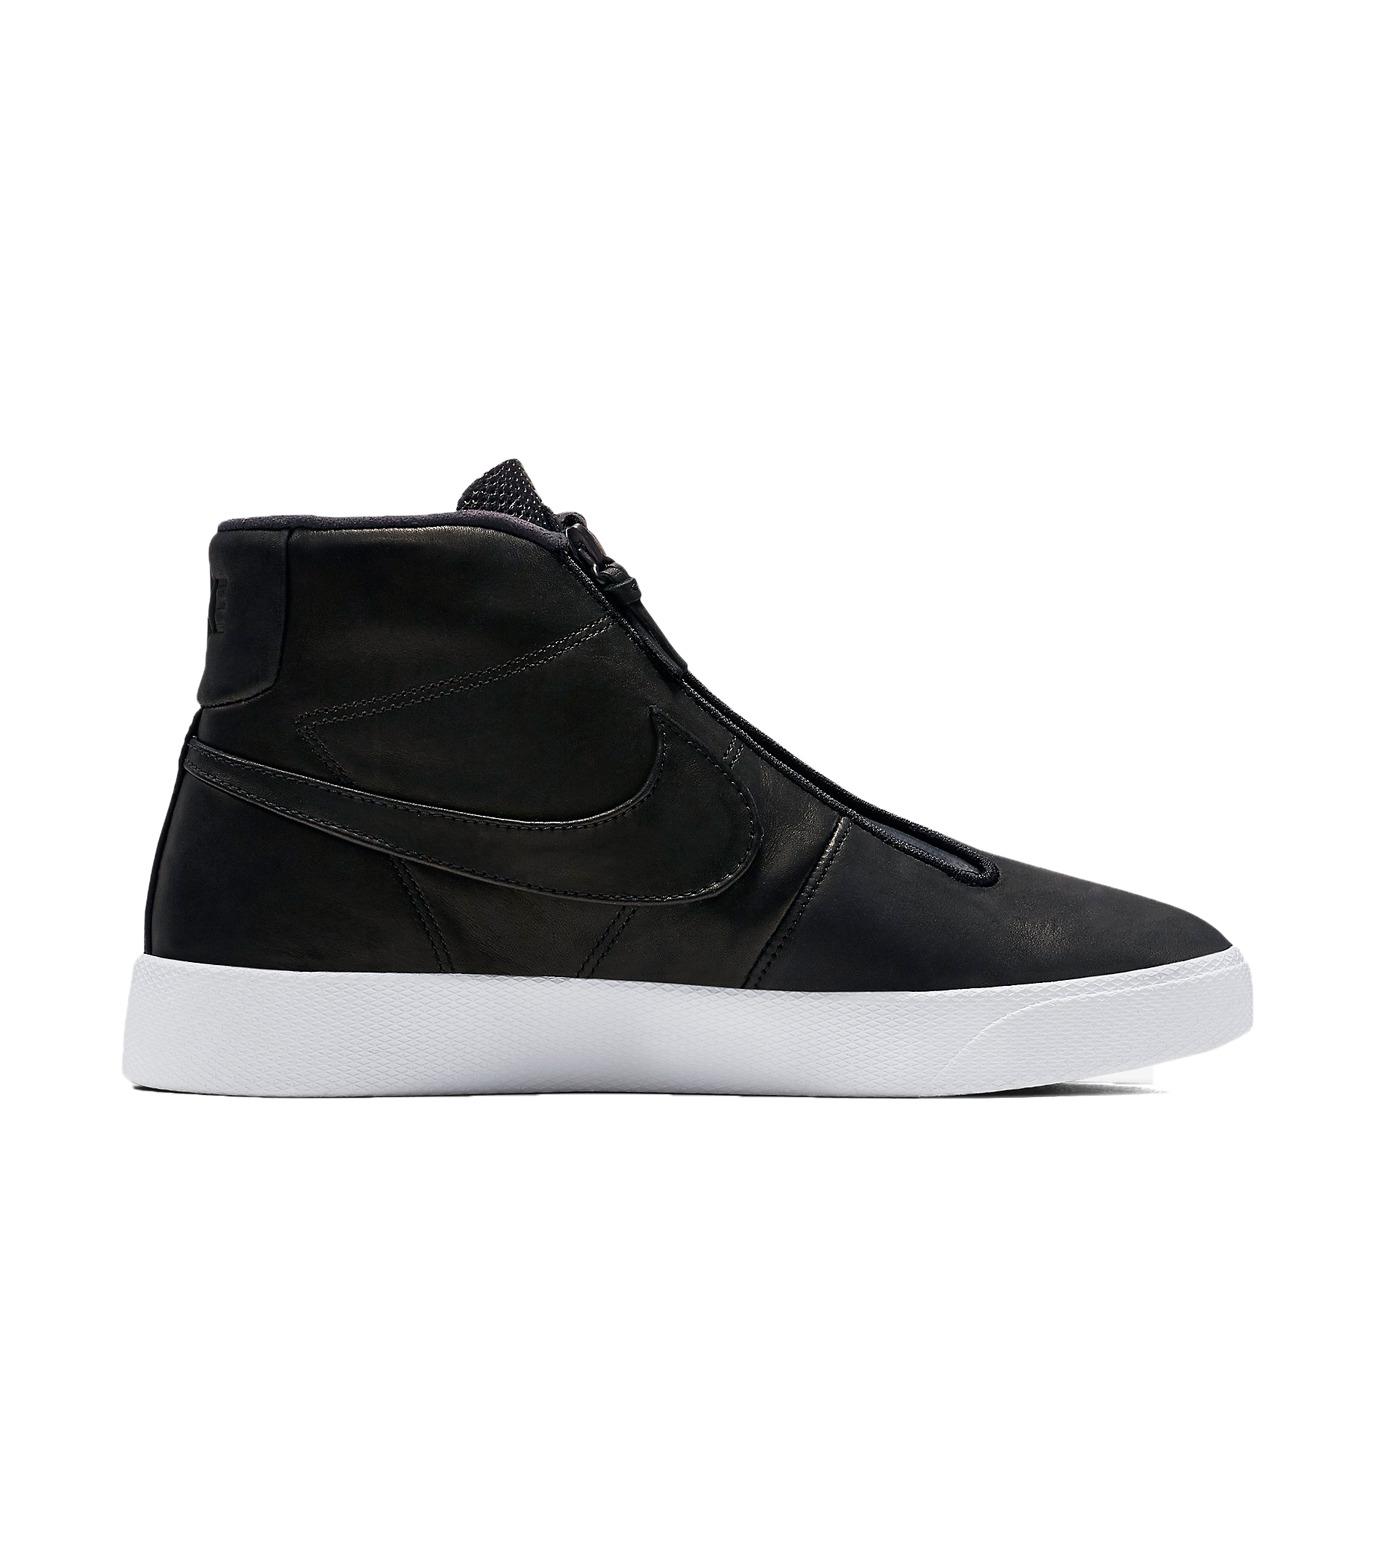 NIKE(ナイキ)のNIKELAB BLAZER ADVNCD-BLACK(シューズ/shoes)-874775-001-13 拡大詳細画像1